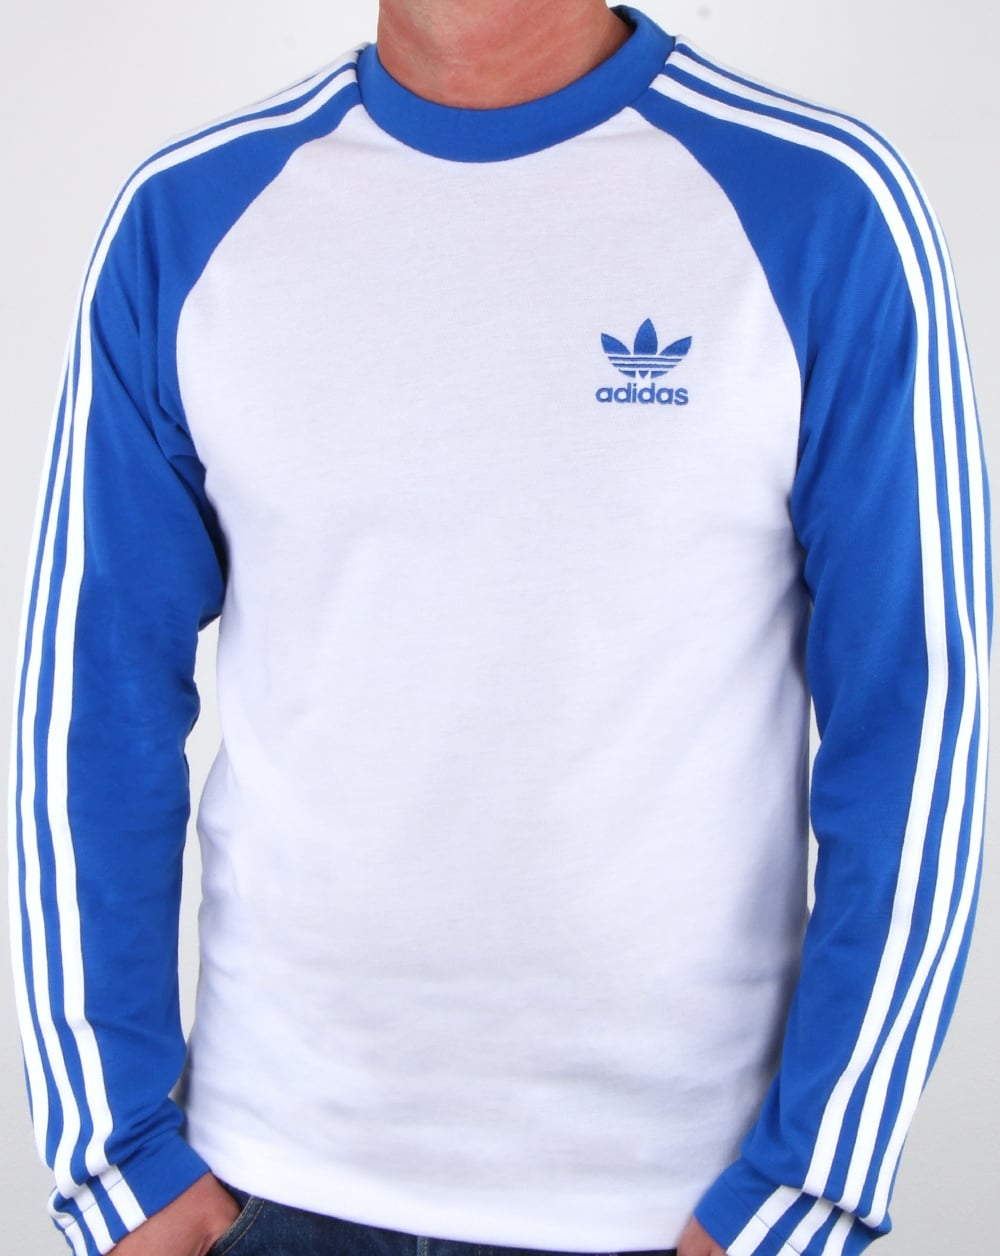 Adidas originals long sleeve 3 stripes t shirt white blue for Blue and white striped long sleeve t shirt